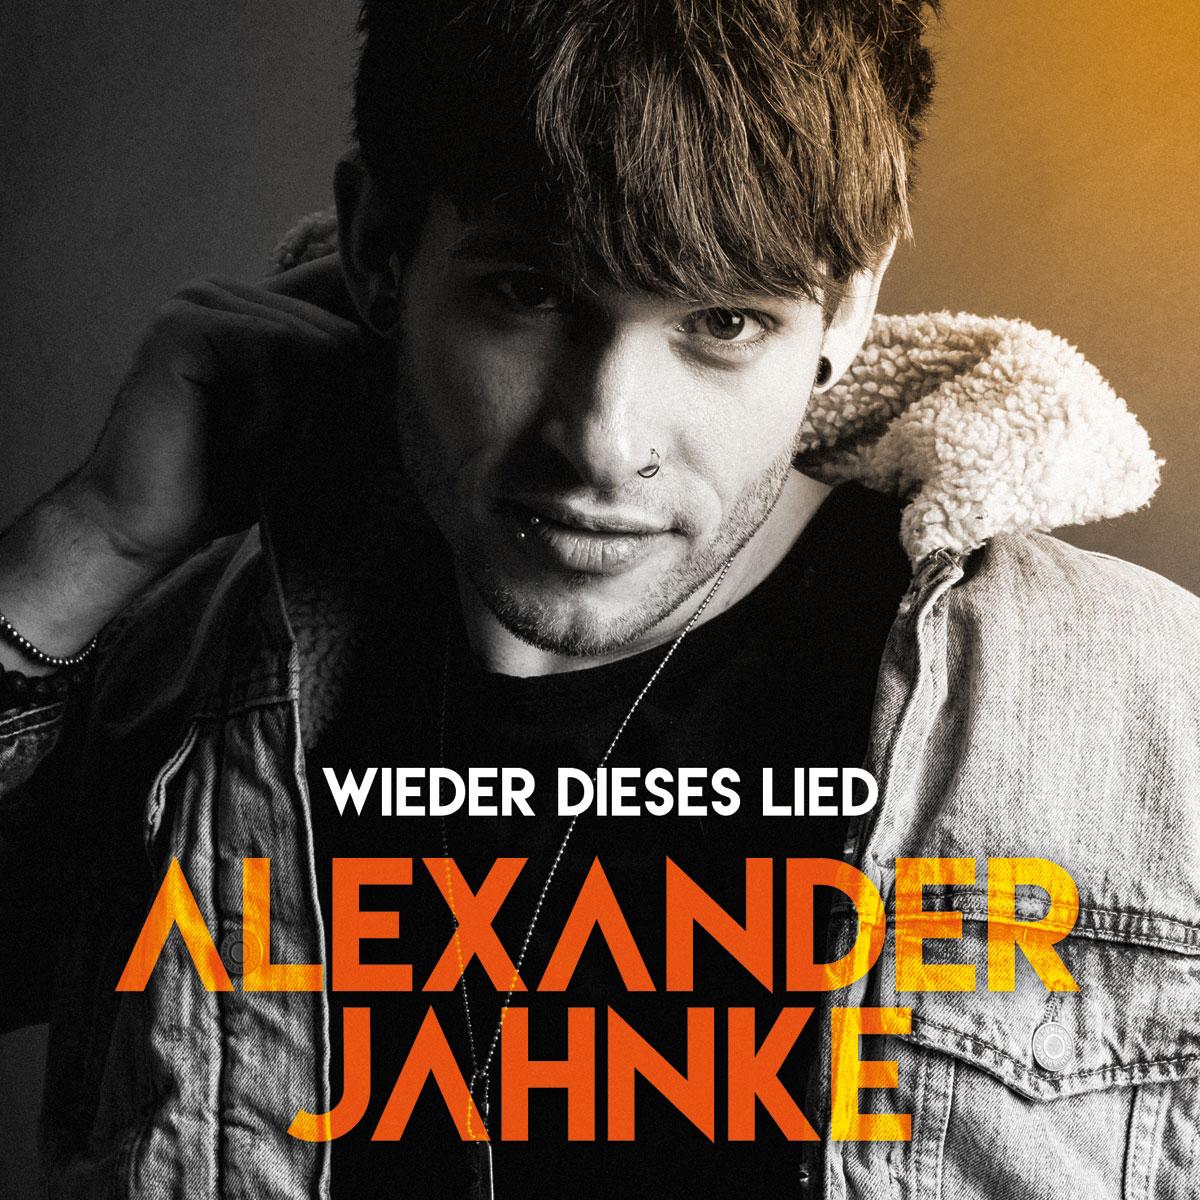 ALEXANDER JAHNKE - WIEDER DIESES LIED